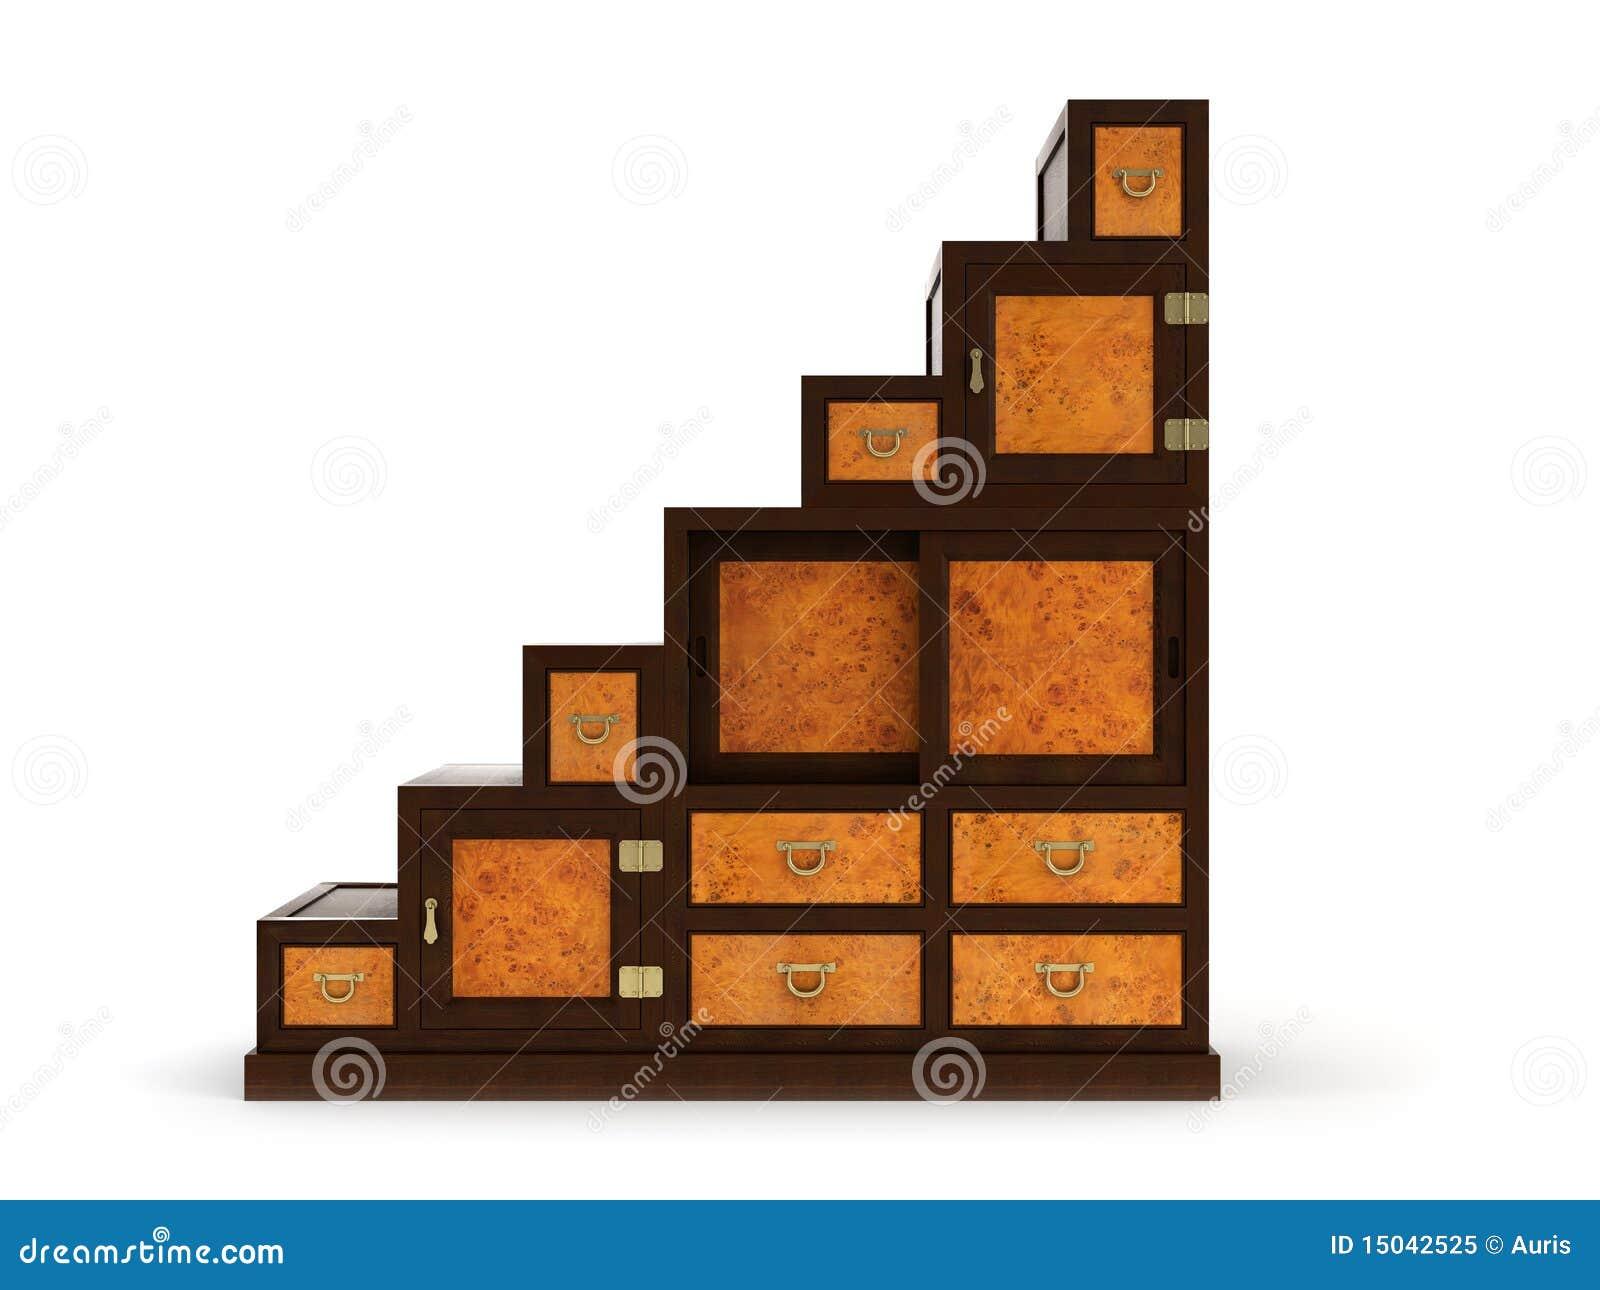 bureau 3d royalty free stock photo image 15042525. Black Bedroom Furniture Sets. Home Design Ideas